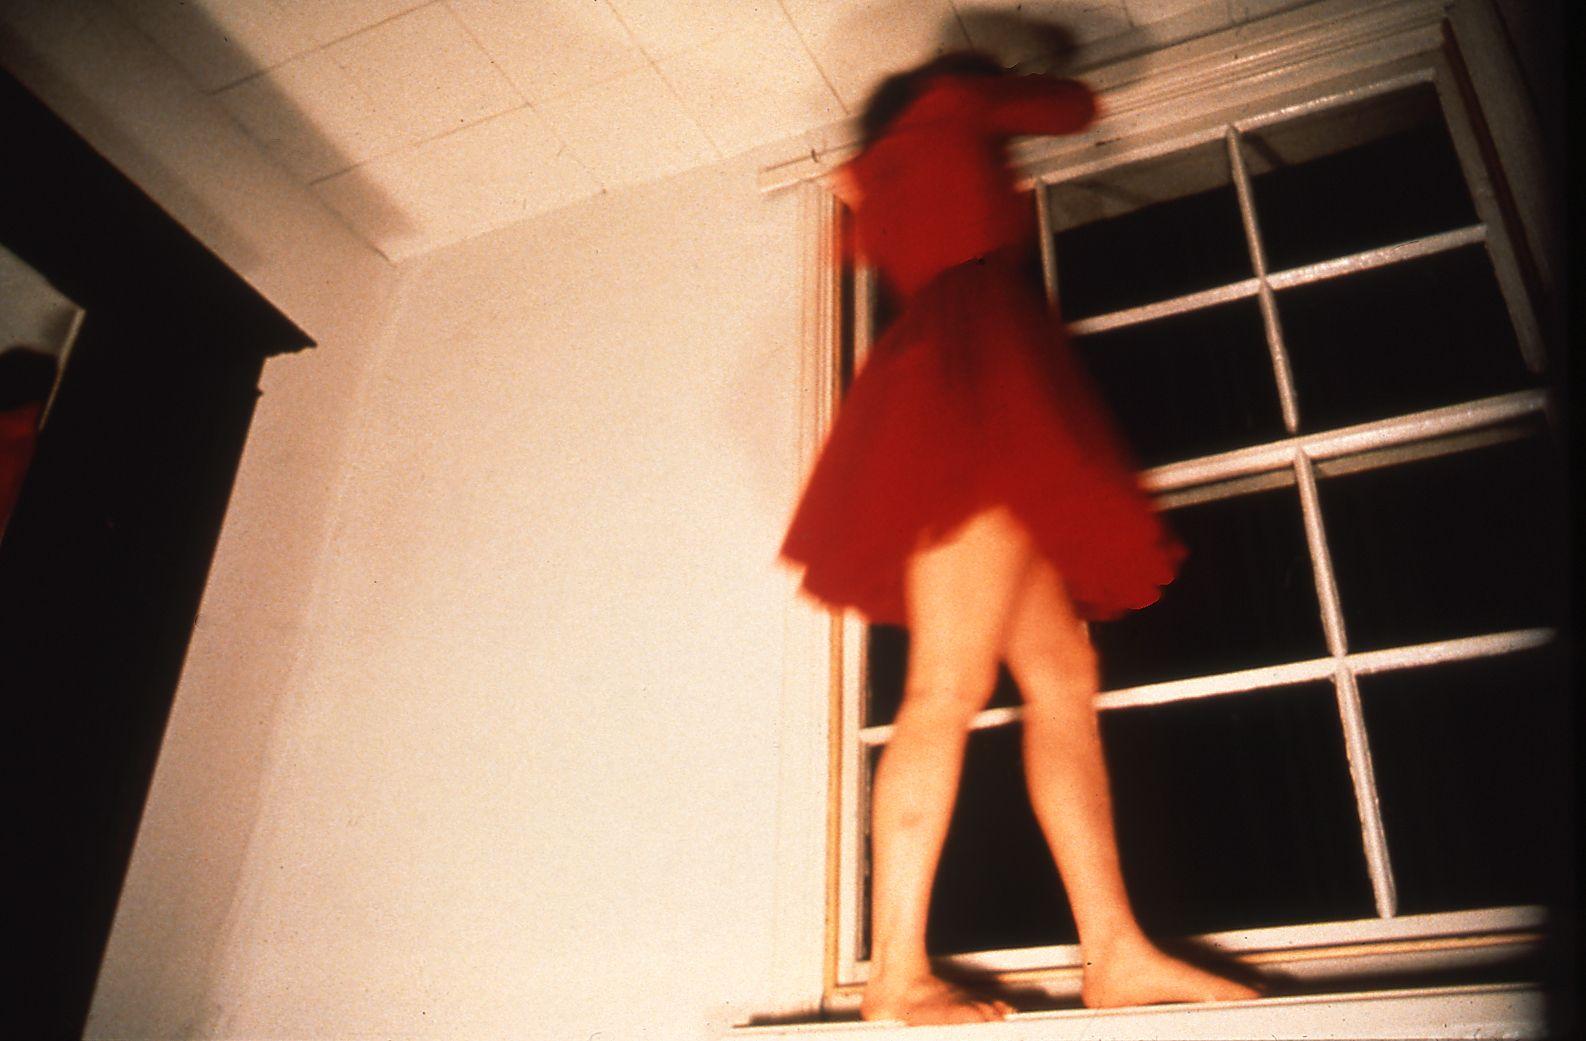 Climbing Around My Room, 1995 (still), VHS video, 8:00 mins